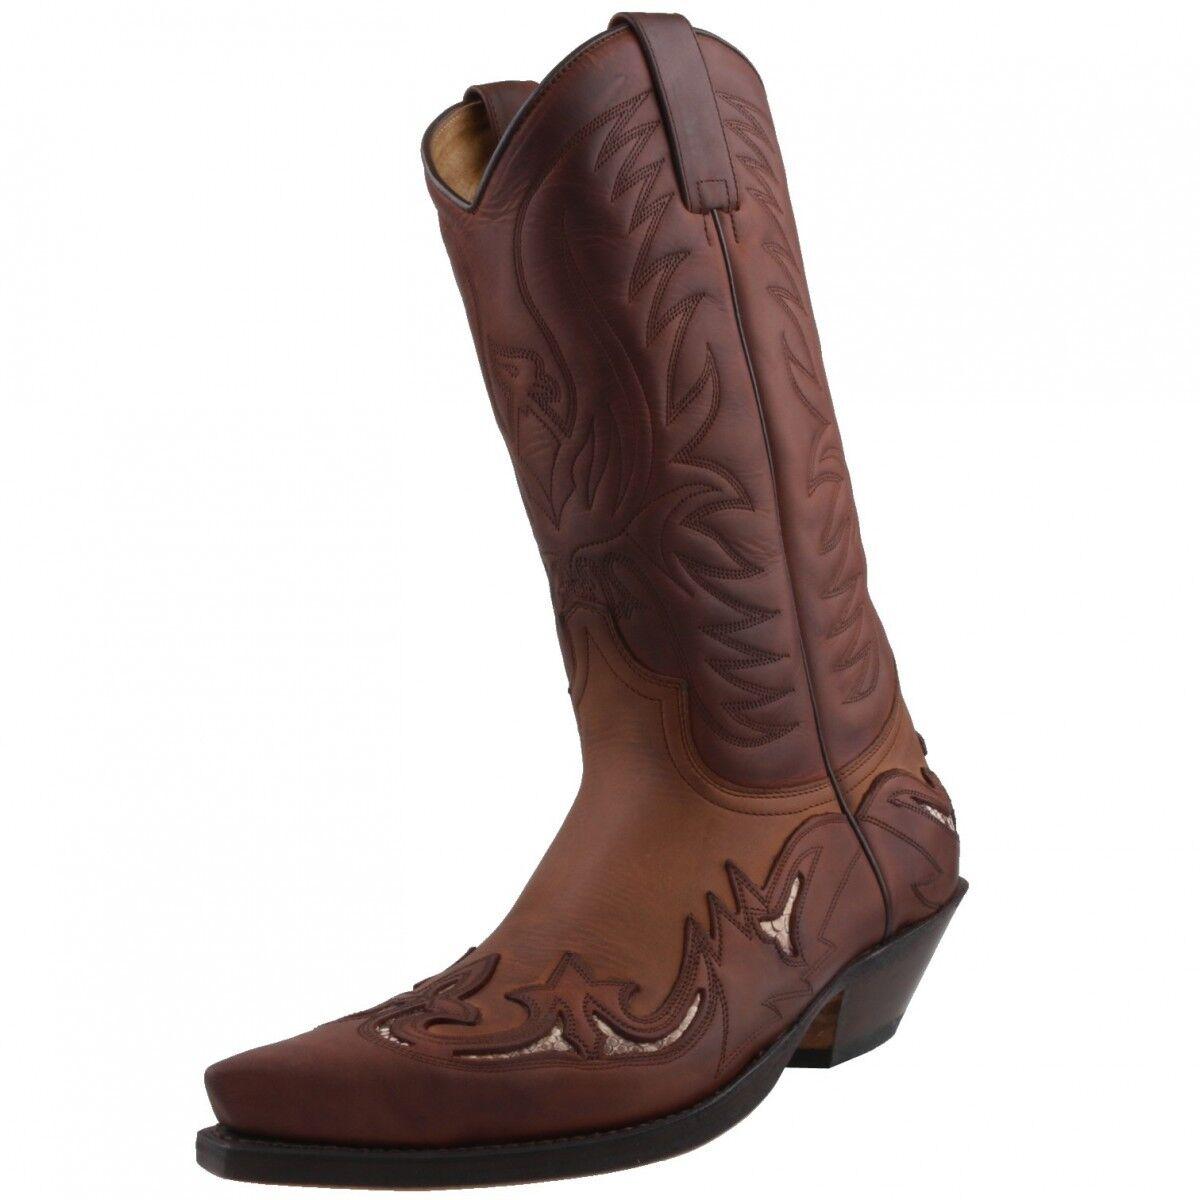 Sendra 3242 Unisex Cowboy Stiefel braun Leather Western Biker Handmade